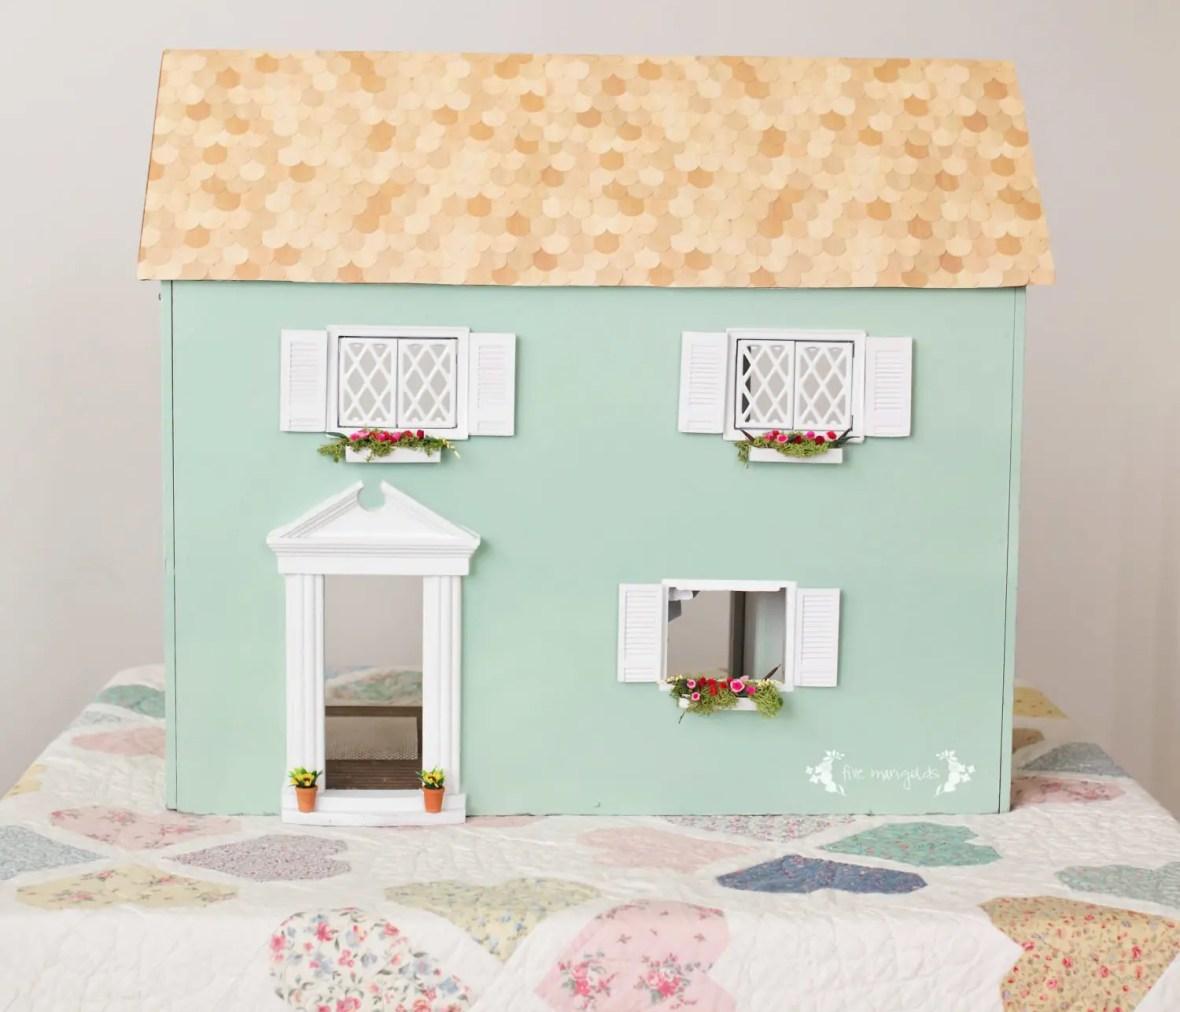 Vintage Dollhouse Makeover Part II Exterior | www.fivemarigolds.com